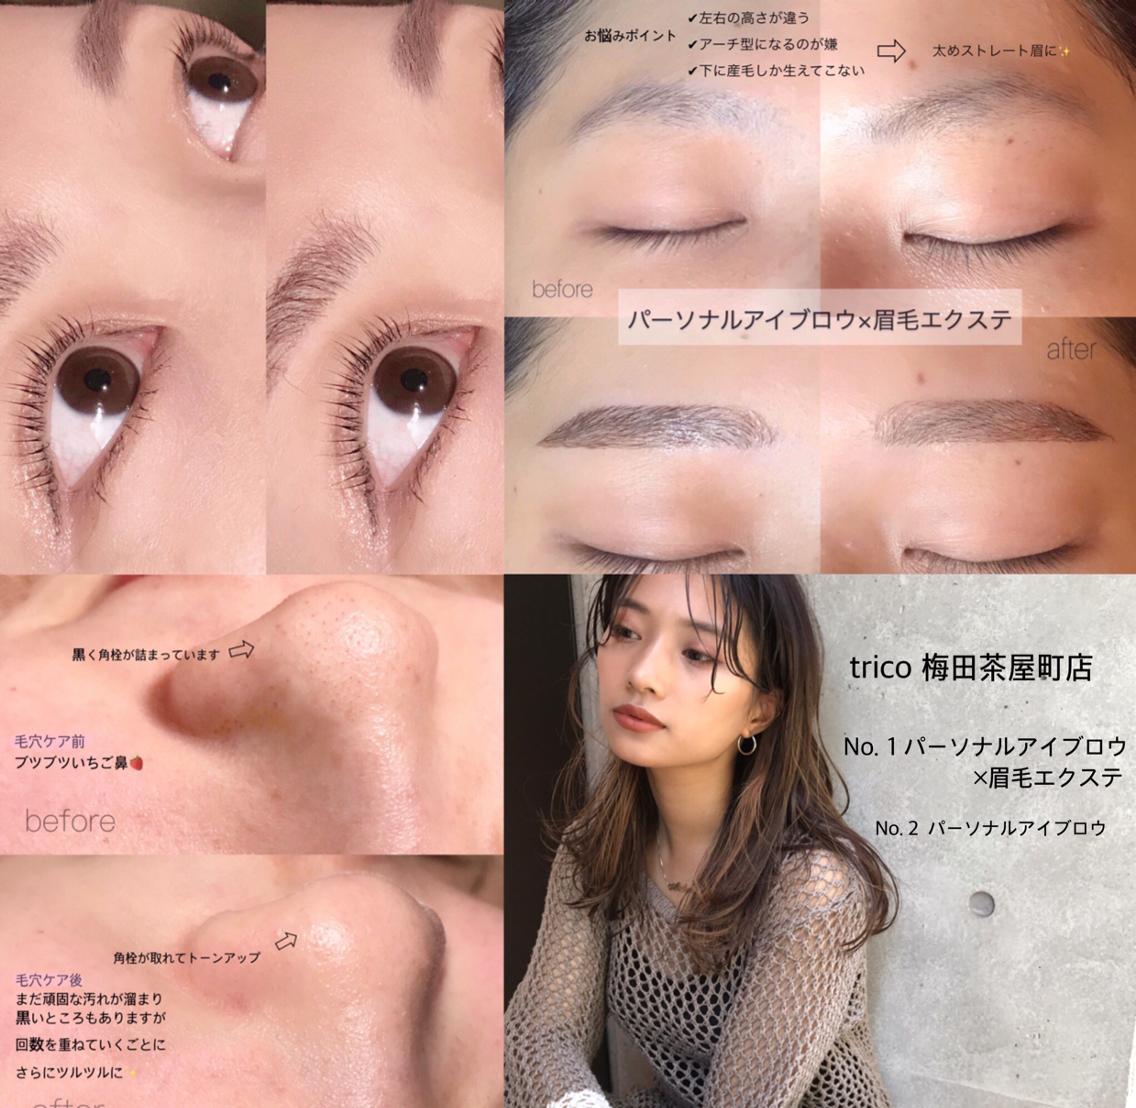 trico所属・渡邊杏奈の掲載